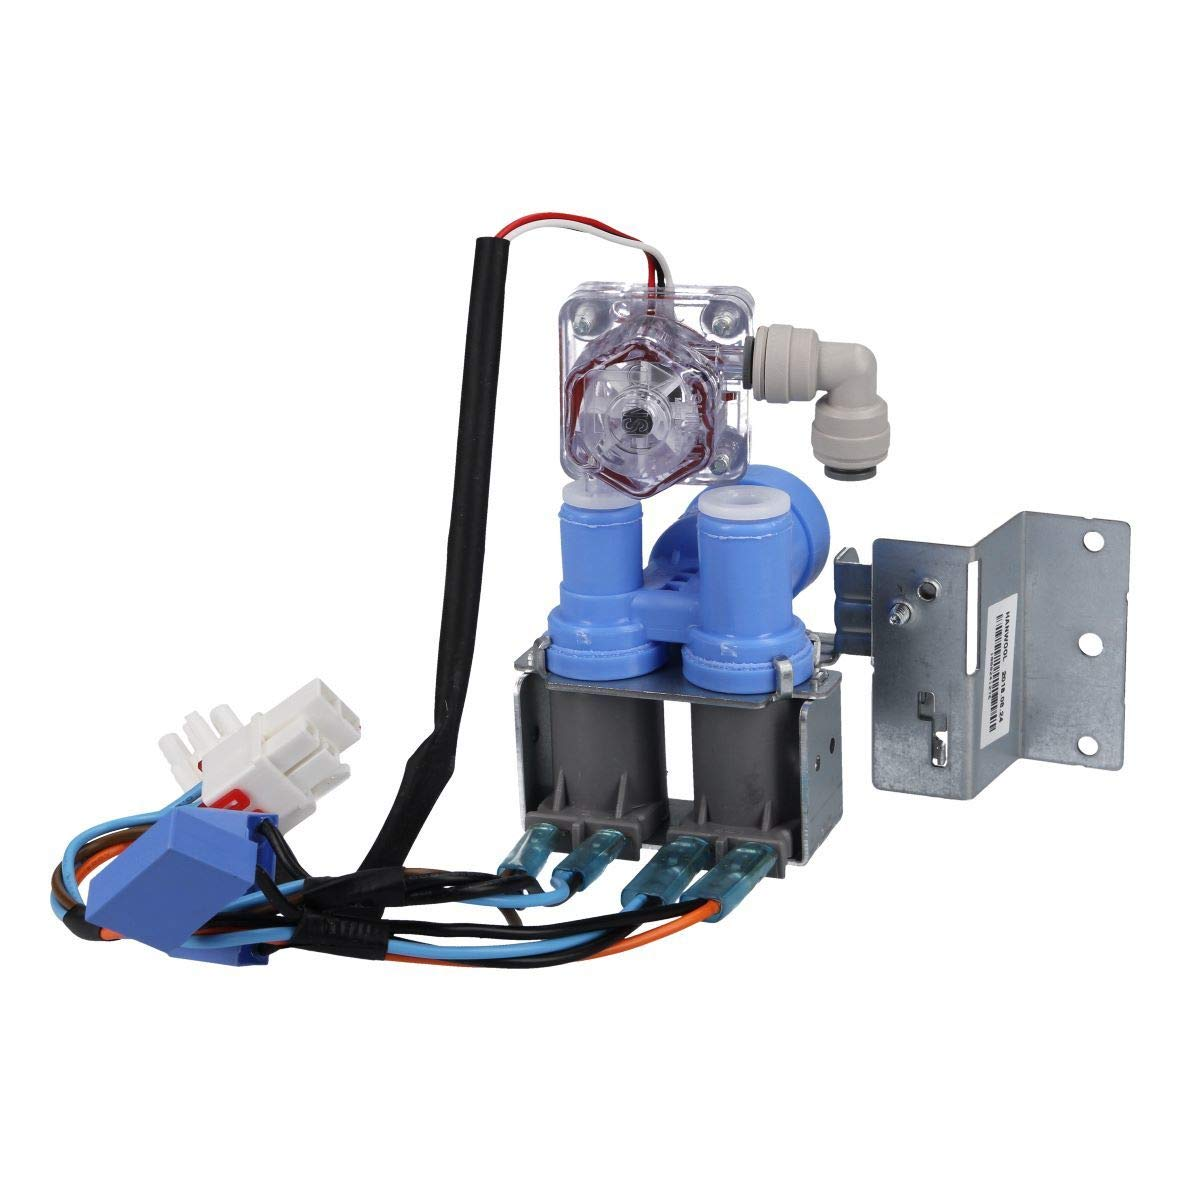 Bosch Siemens 497830 00497830 ORIGINAL Zweiwegeventil Magnetventil Elektroventil Ventil zweifach K/ühlautomat K/ühlschrank K/ühlger/ät auch Balay Constructa Neff